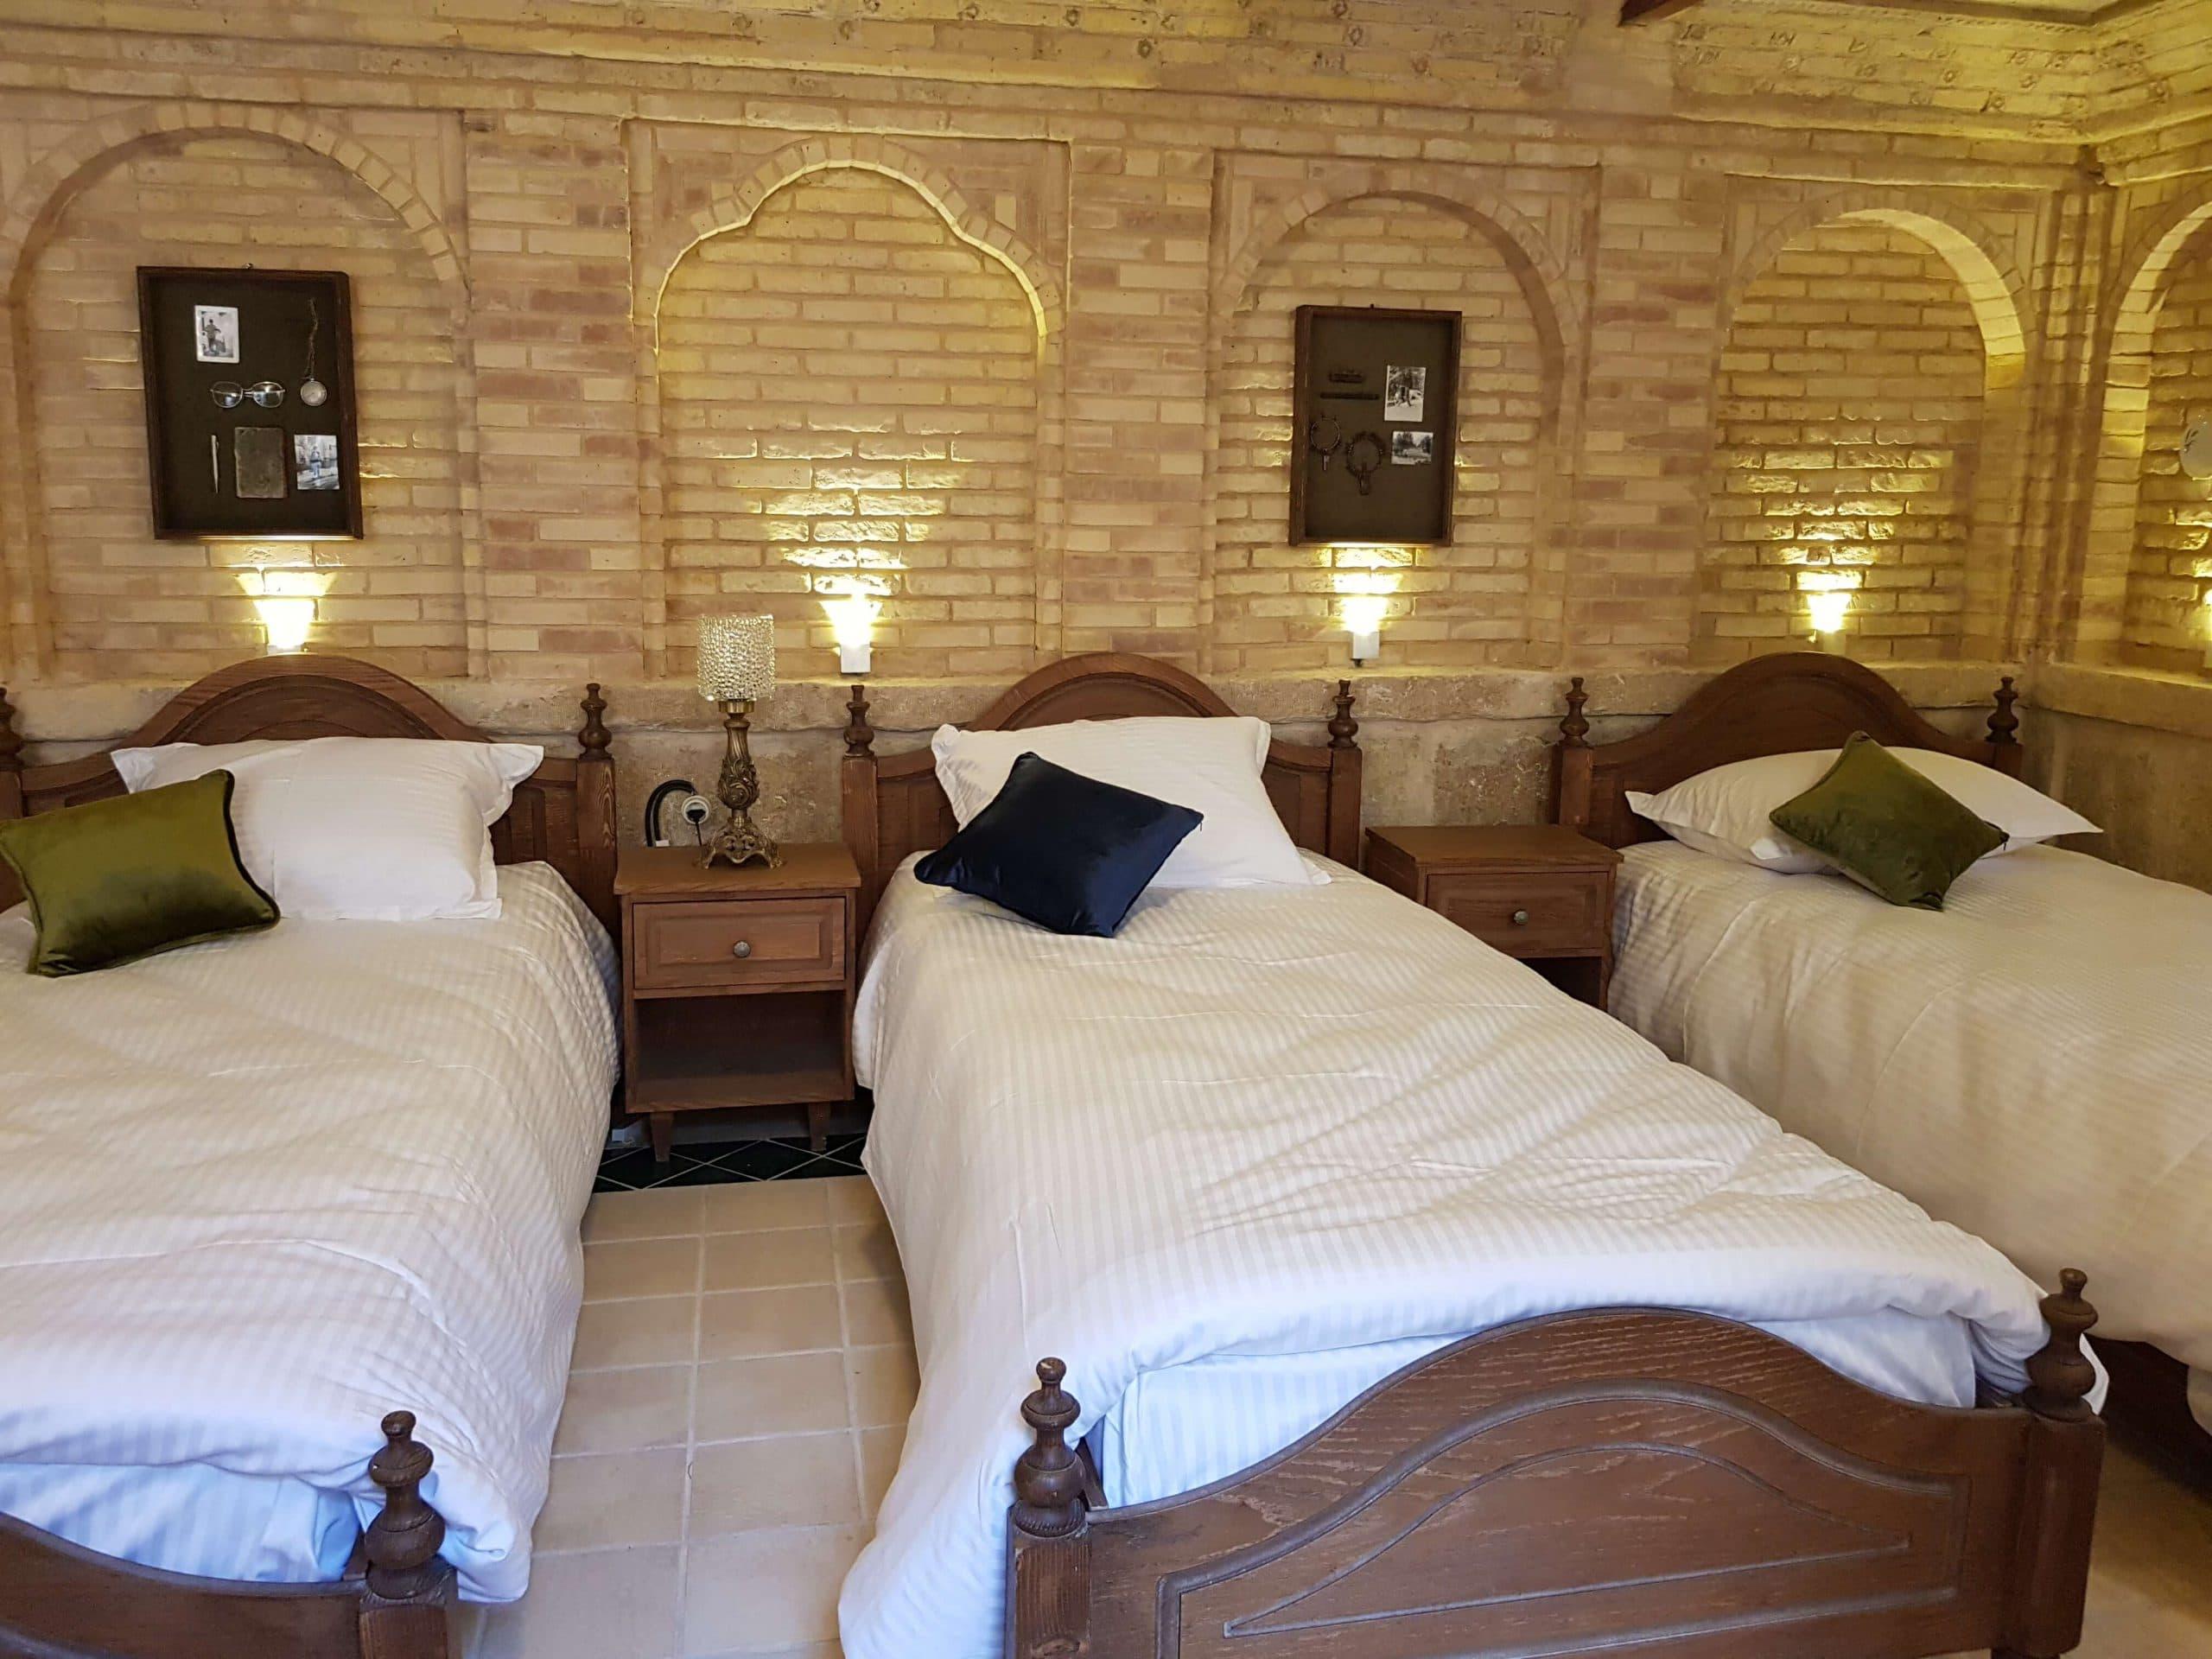 اتاق ملک تاج هتل بوتیک راوی